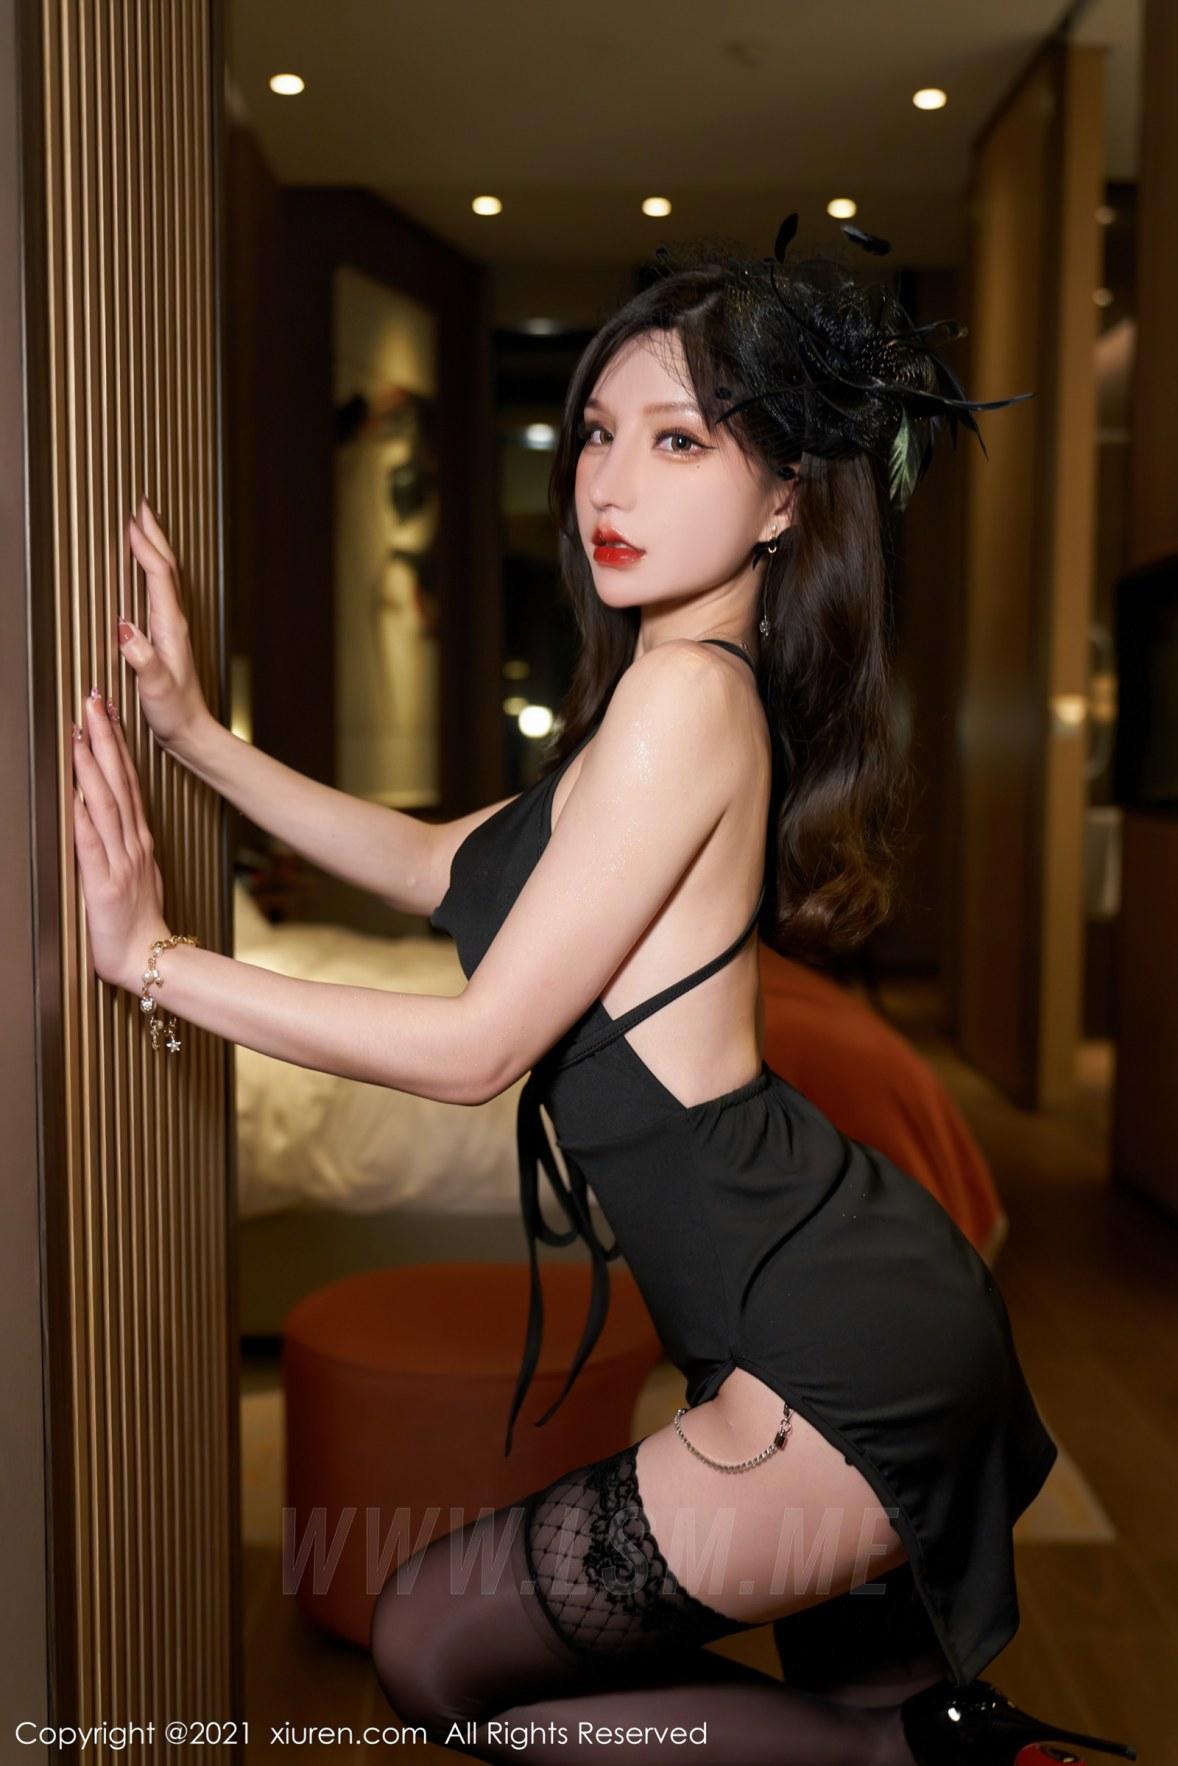 3584 007 t3c 3603 5400 - XiuRen 秀人 No.3584 吊裙服饰 周于希Sandy 性感写真2 - 秀人网 -【免费在线写真】【丽人丝语】